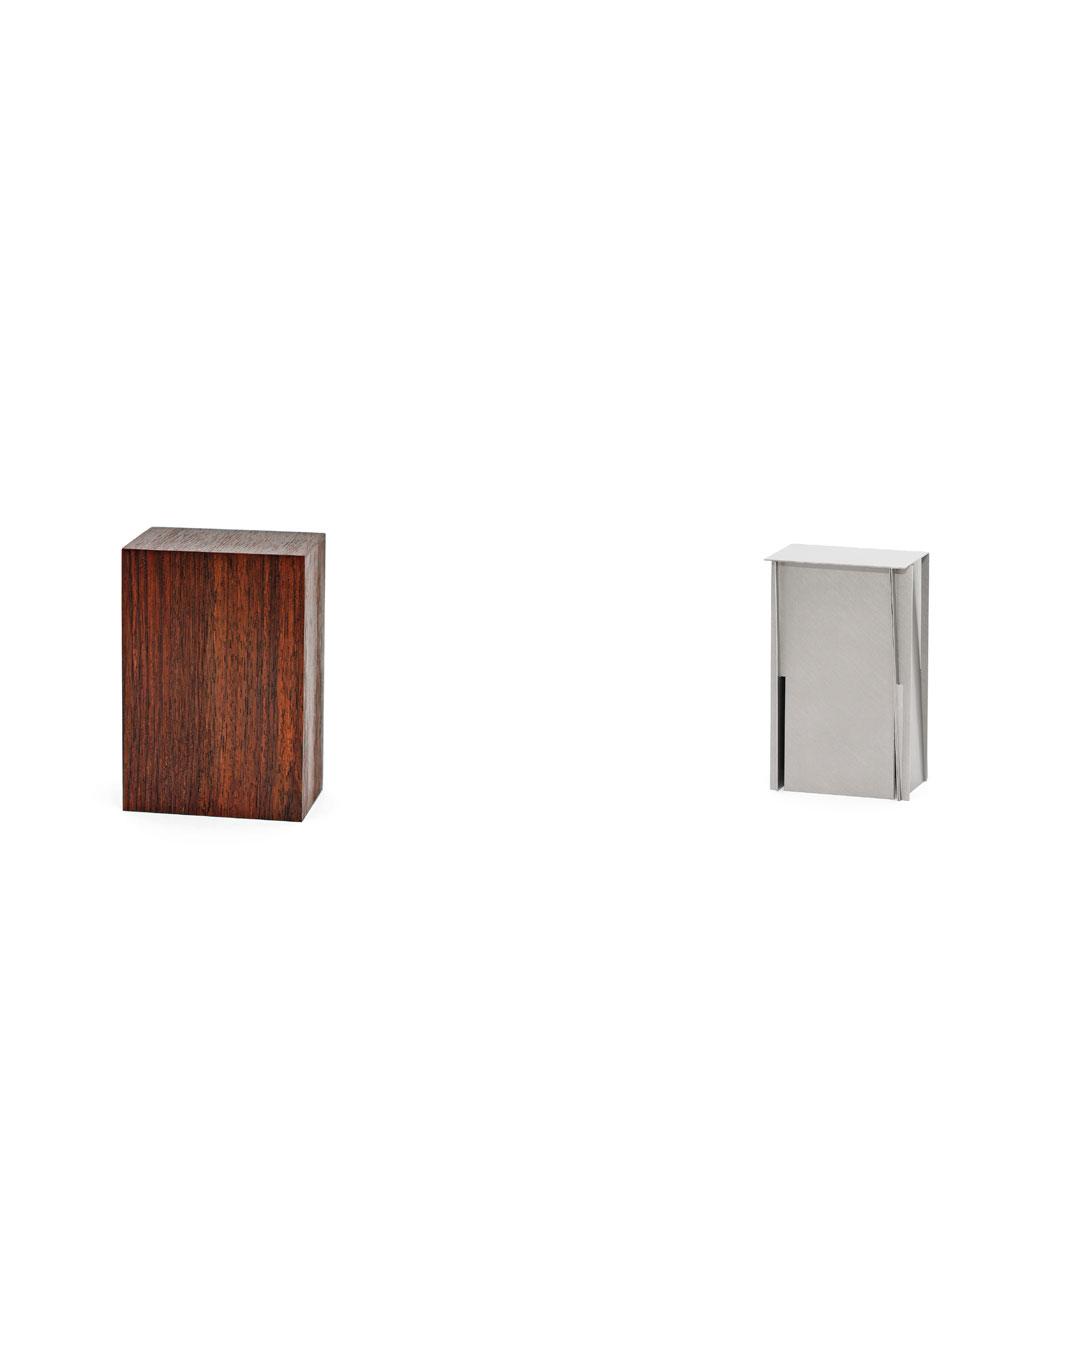 Junwon Jung, Box 2, 2019, brooch; titanium, steel, wood, 90 x 55 x 35 mm, €2900 (image 2/2)